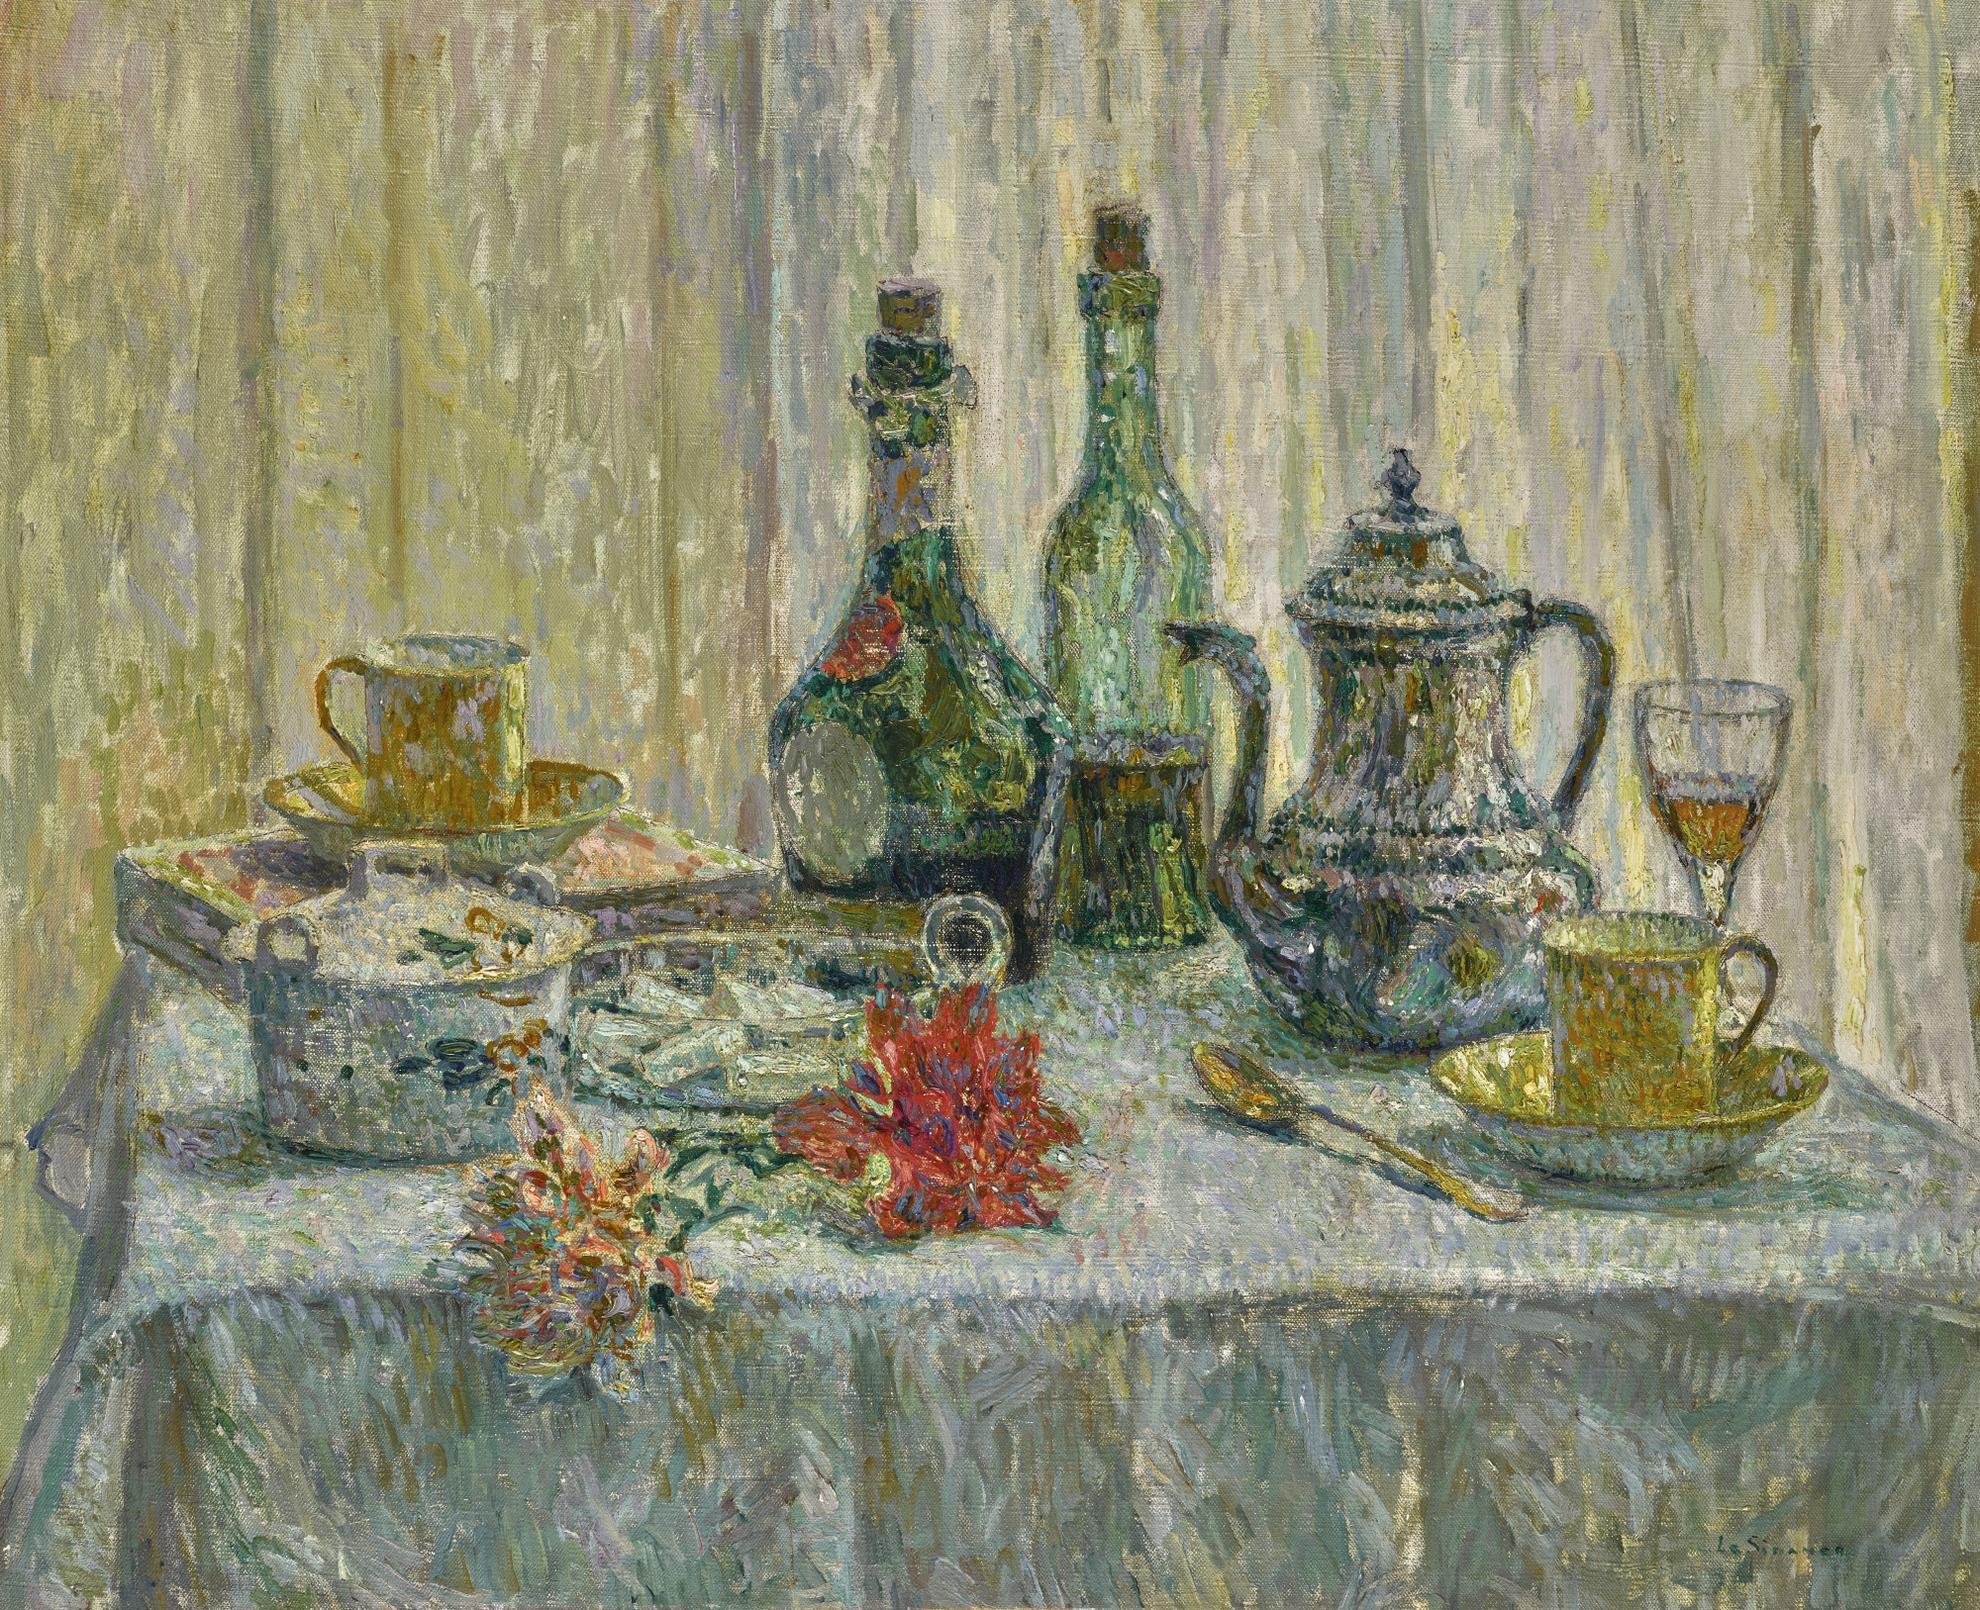 Henri Eugene Le Sidaner-La Table Devant La Fenetre-1921